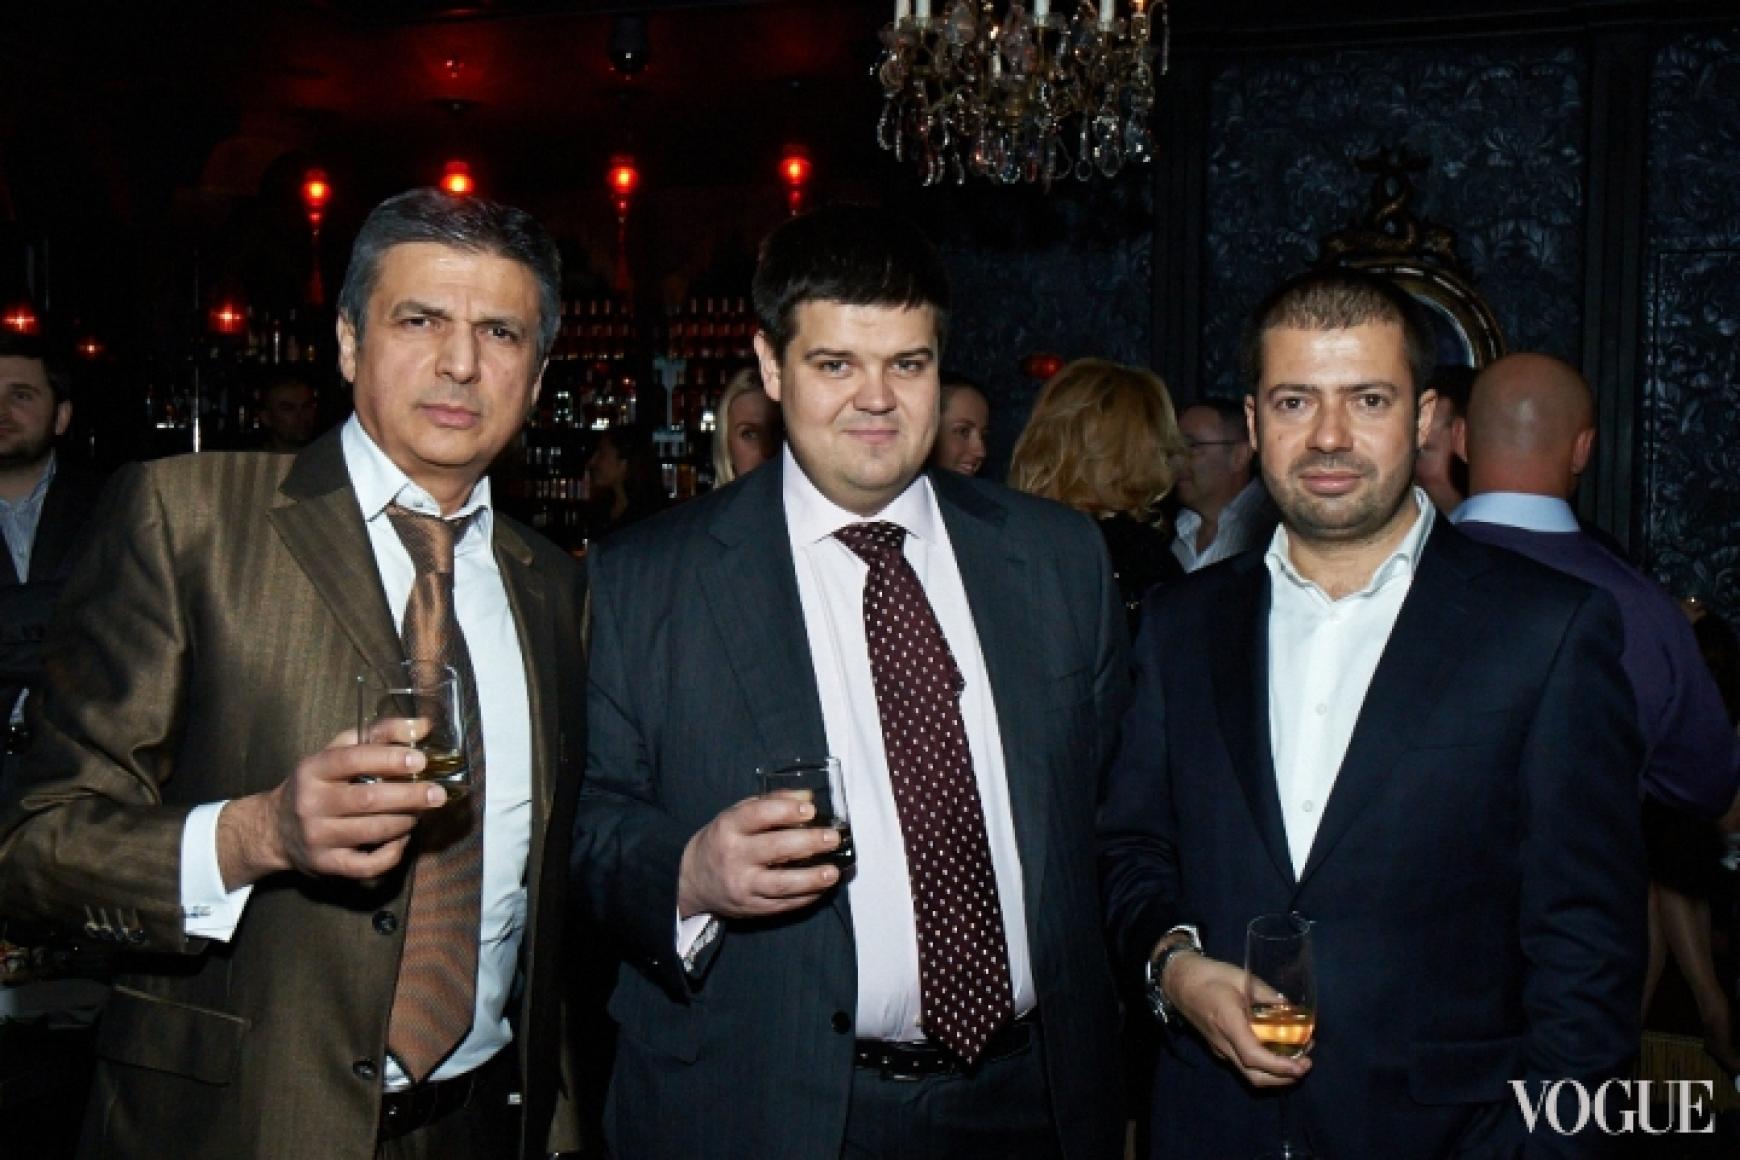 Вагиф Алиев (слева), Александр Черницкий (справа)